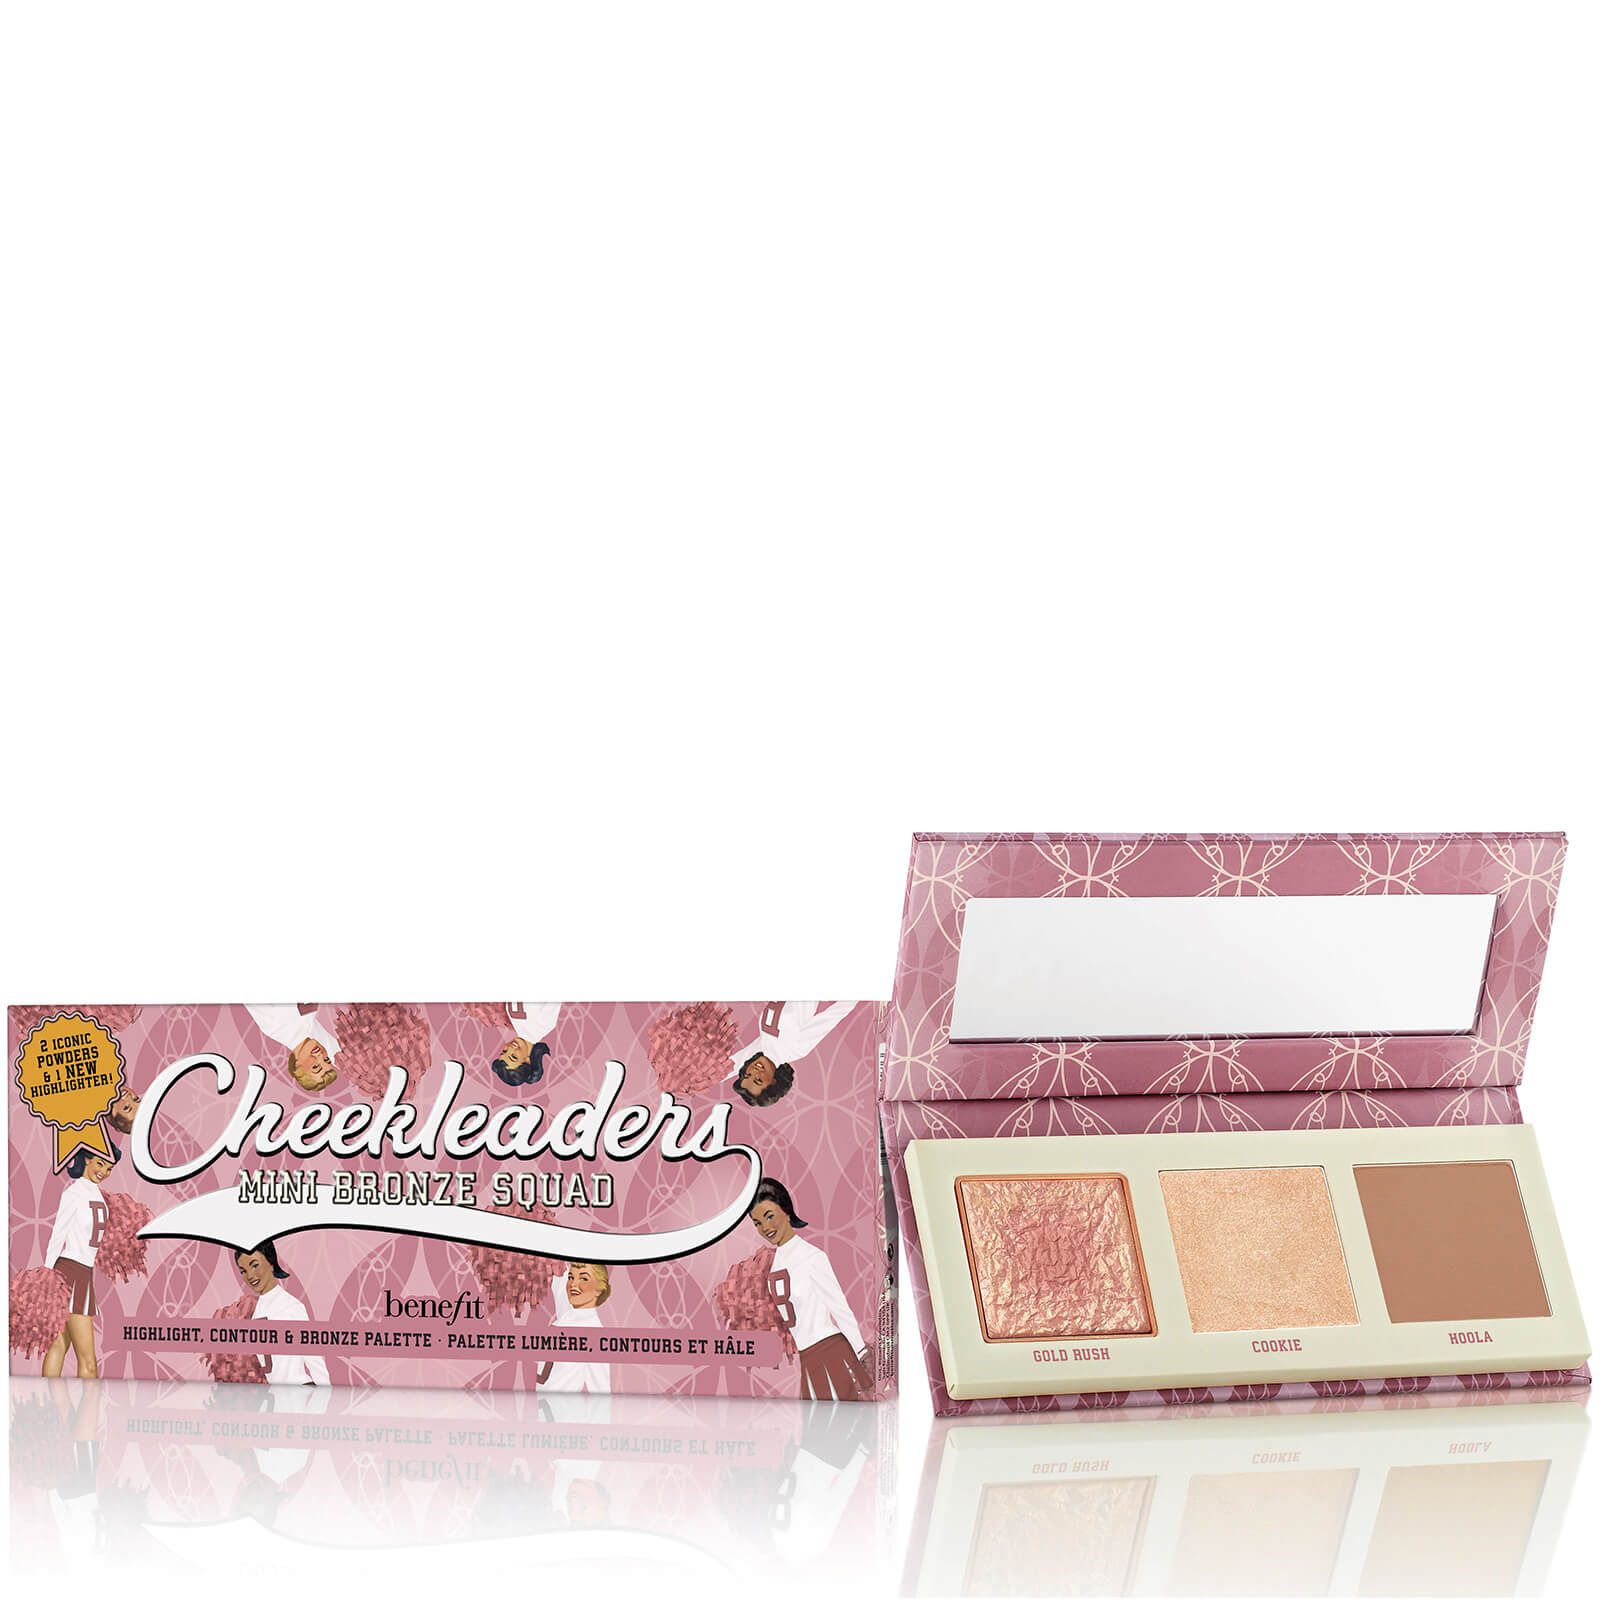 benefit Cheekleaders Mini Bronze Squad Palette | Free Shipping | Lookfantastic